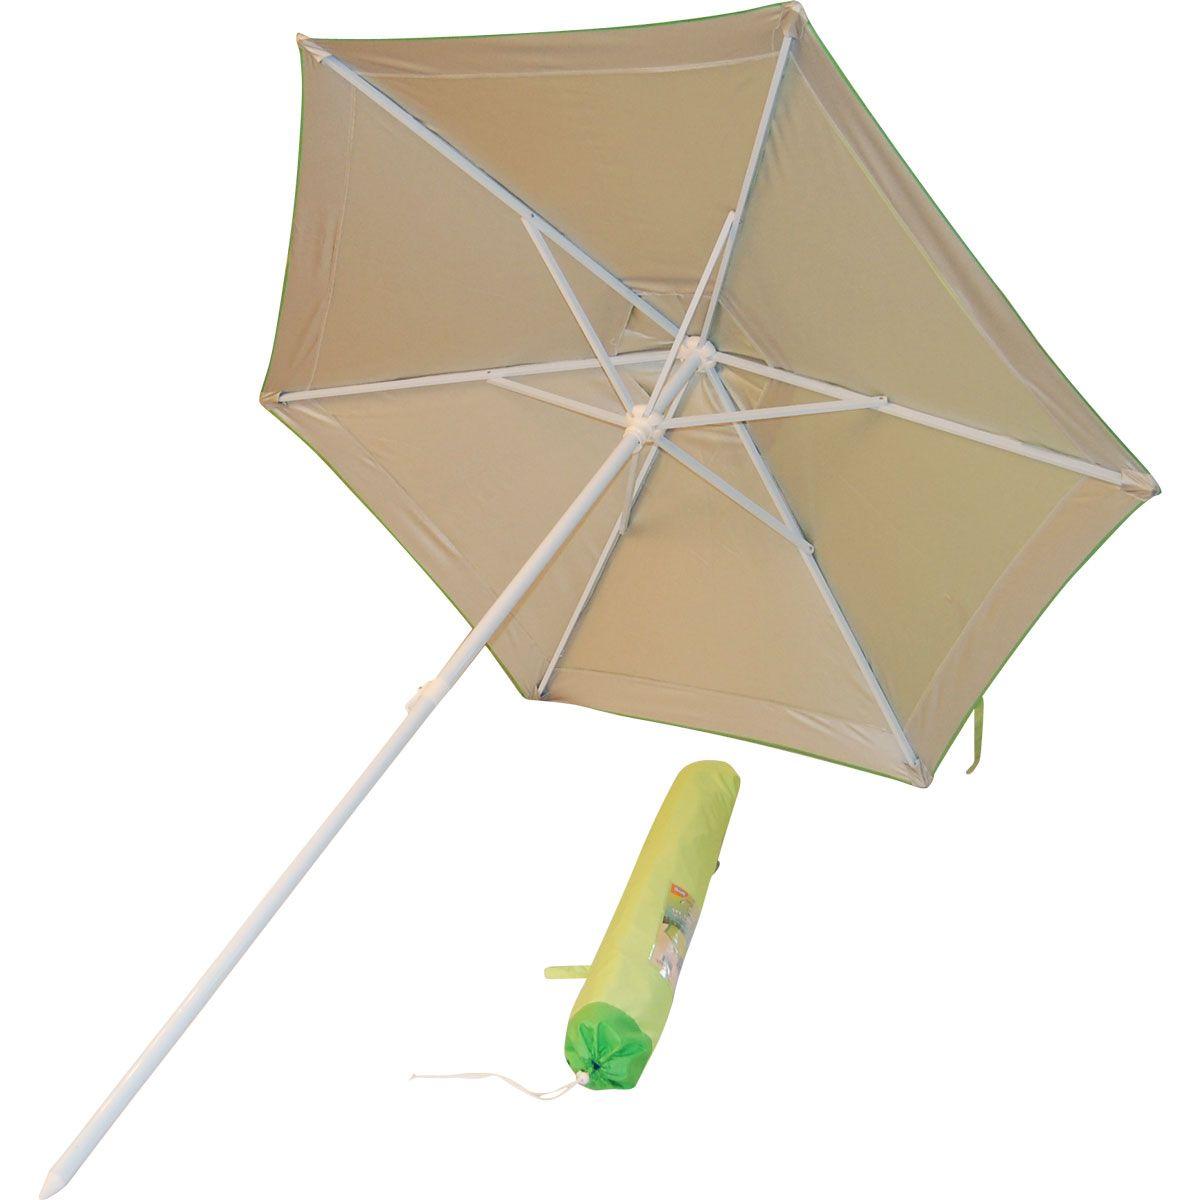 Market Style SPF 35 Vented Beach/Patio Umbrella   Green |